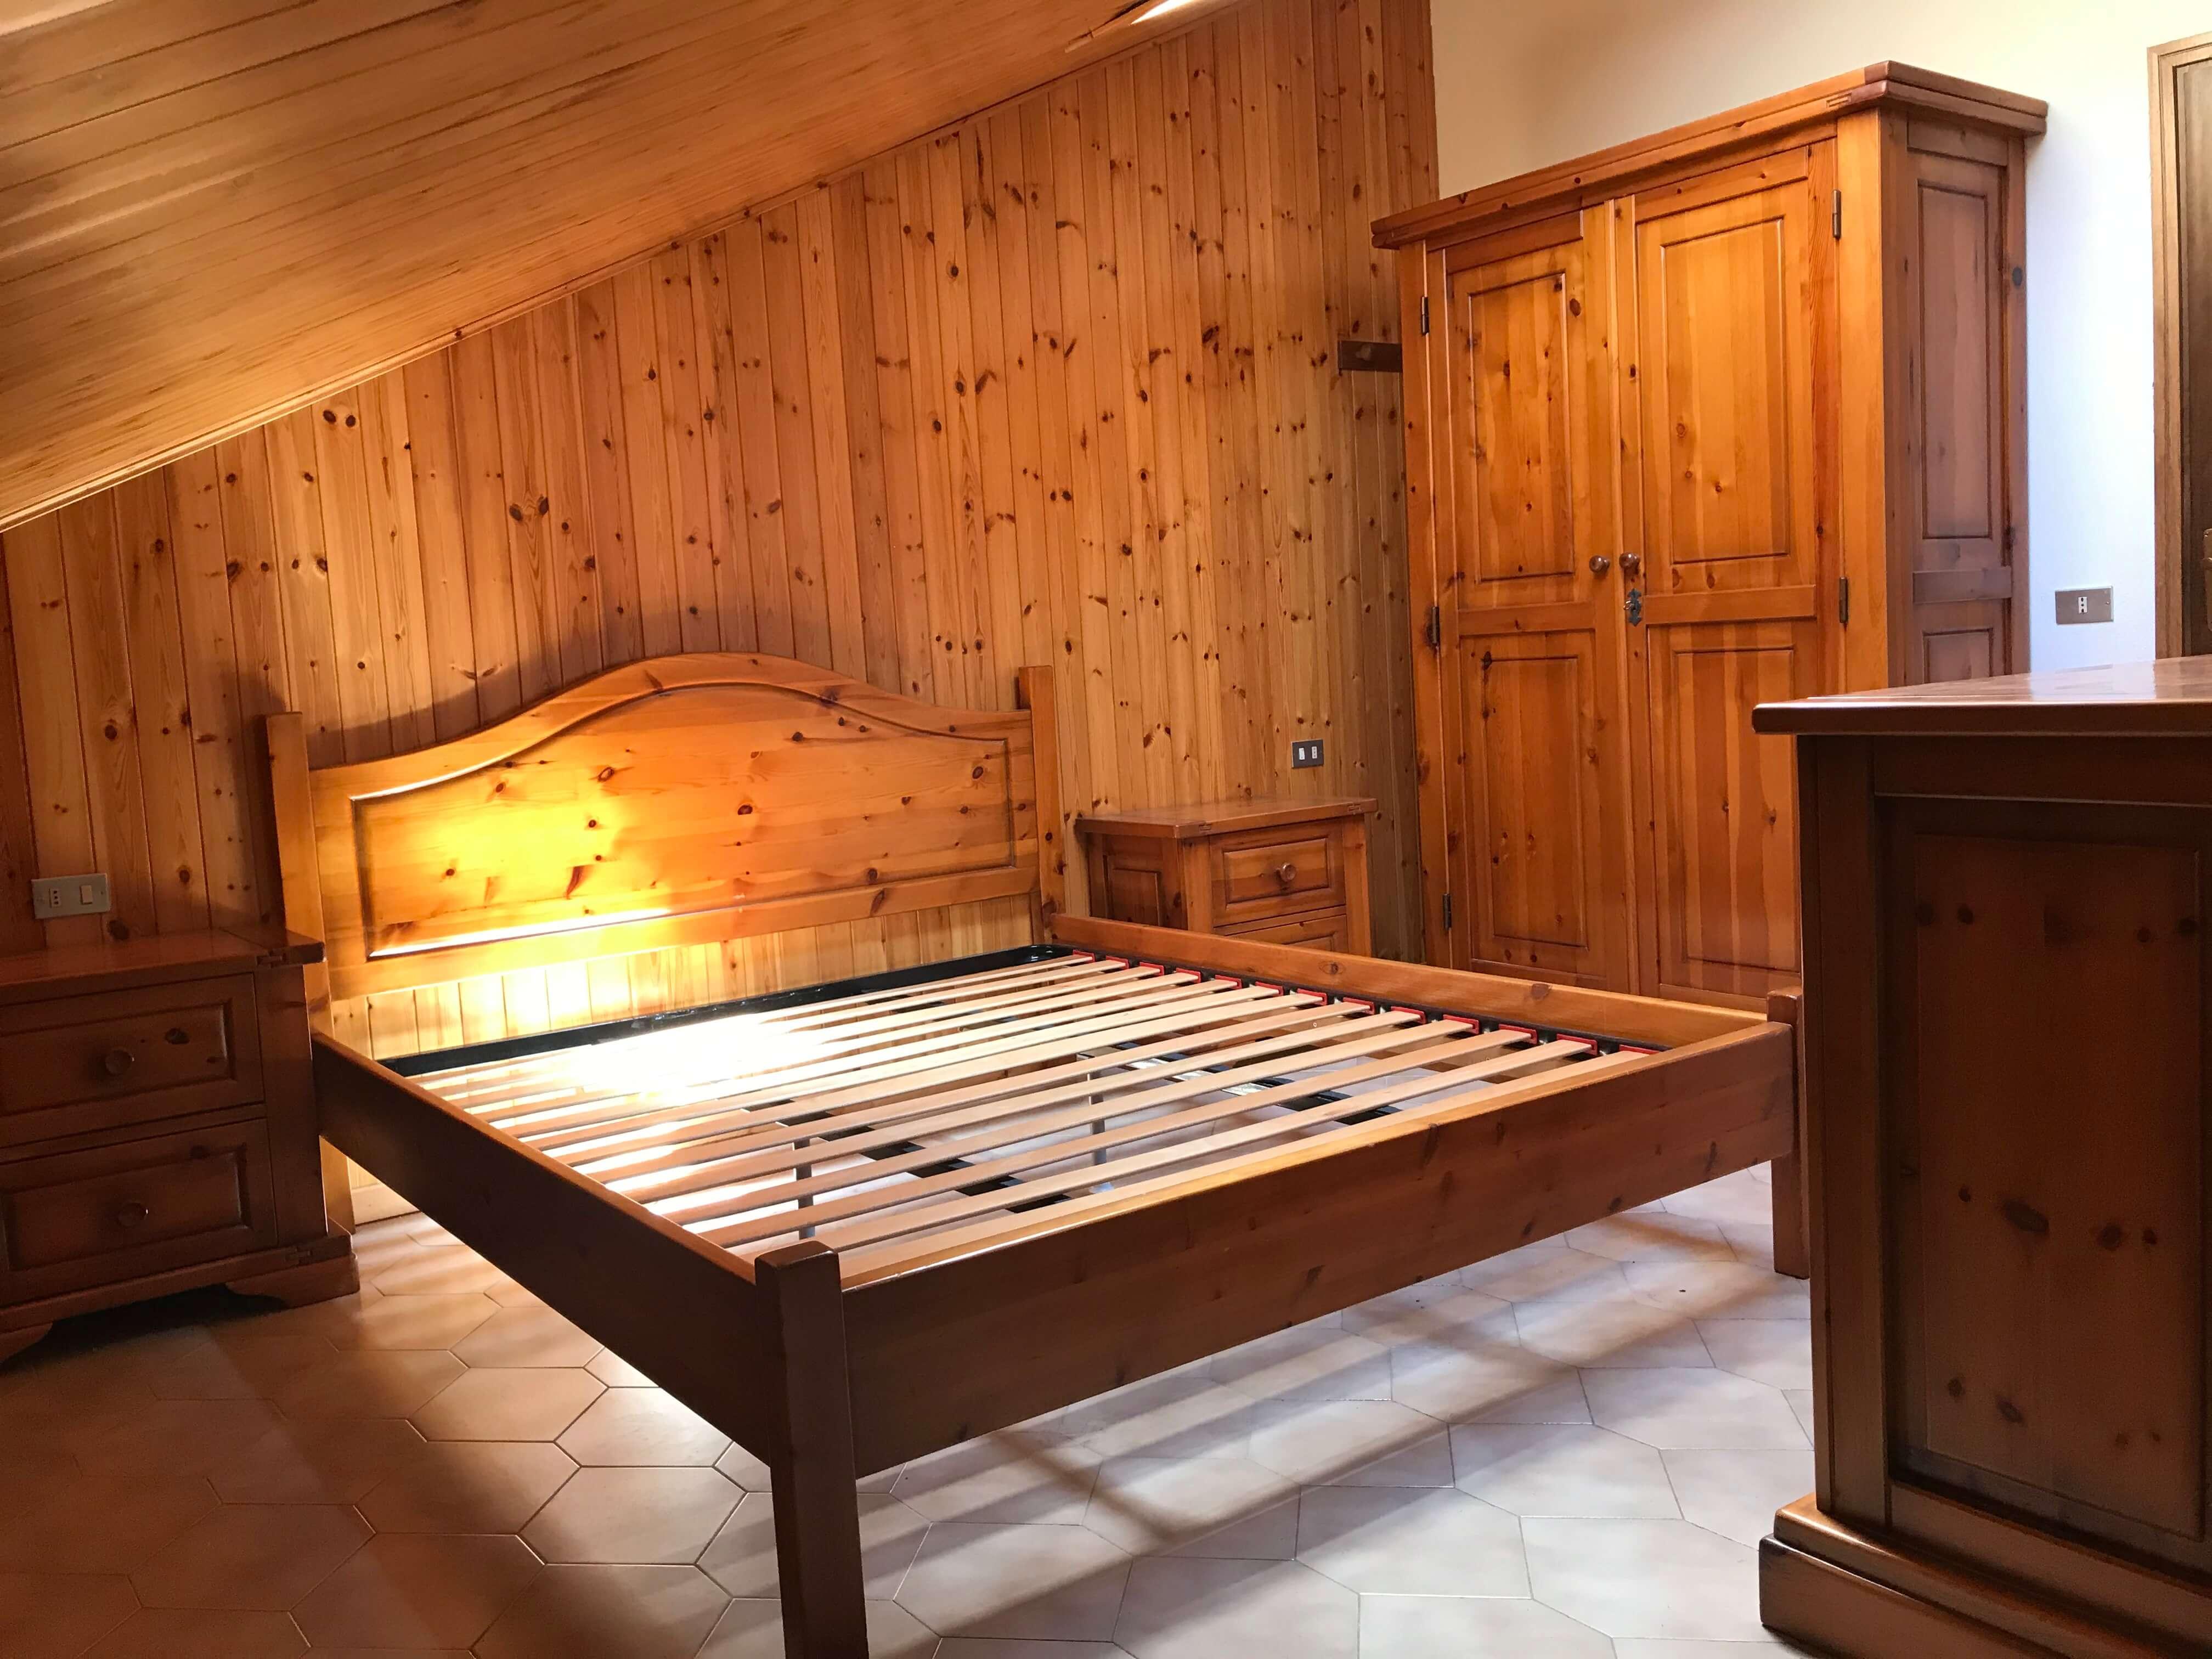 Immobiliare Abita mansarda bilocale in vendita -camera matrimoniale